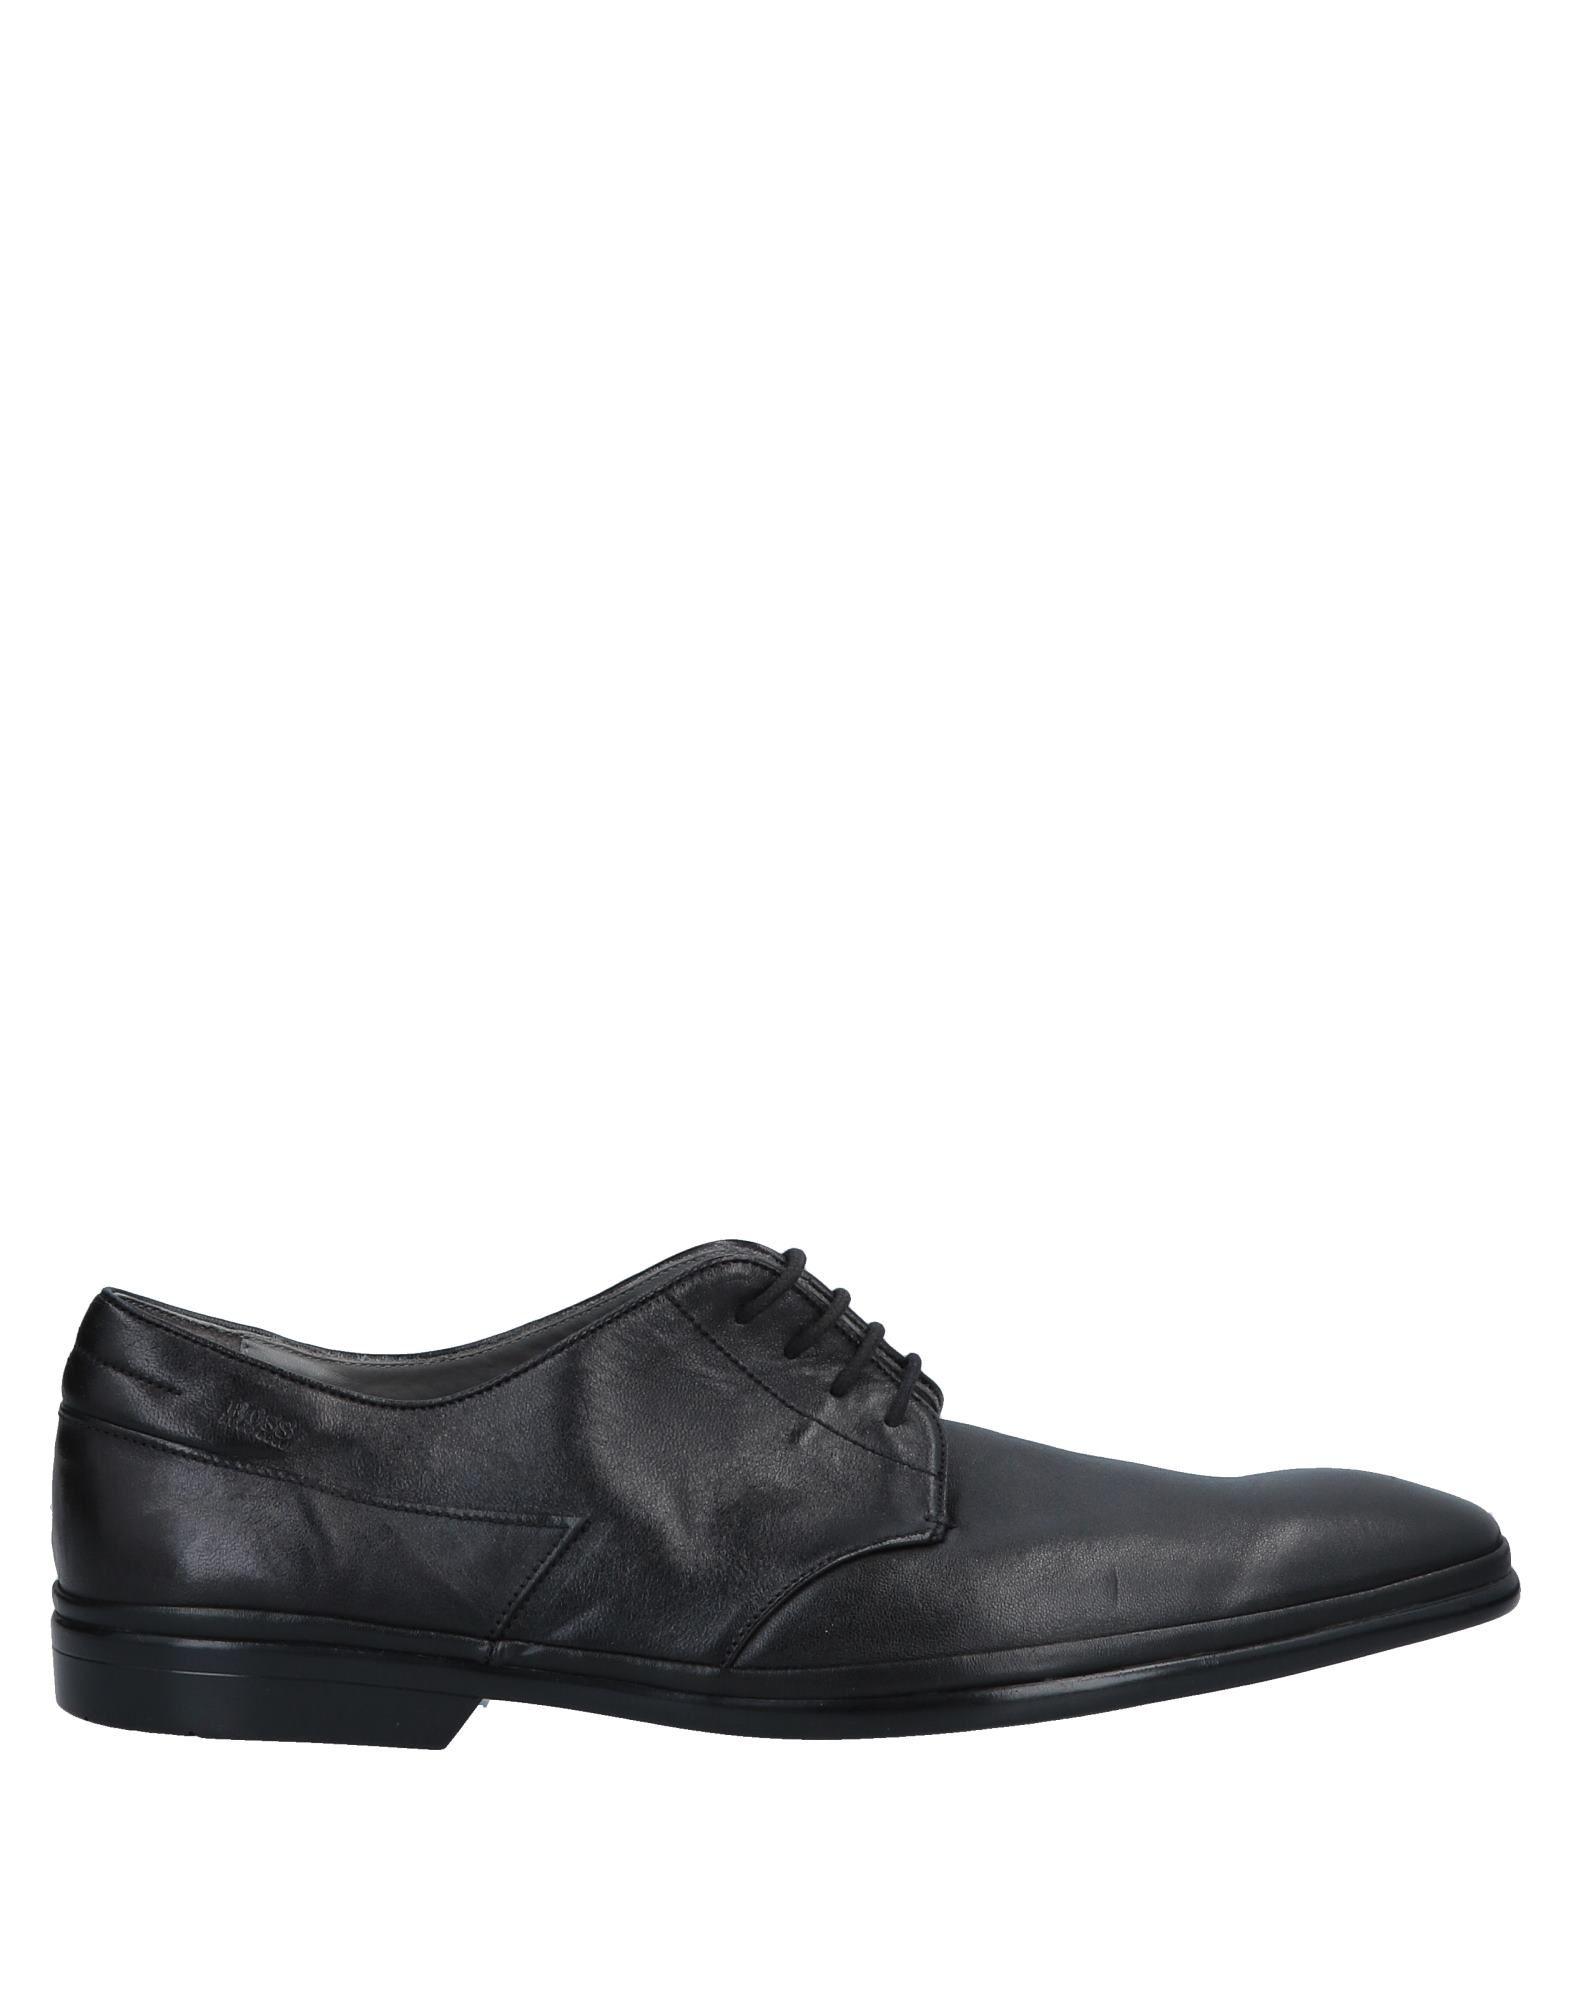 Фото - BOSS BLACK Обувь на шнурках обувь на высокой платформе dkny